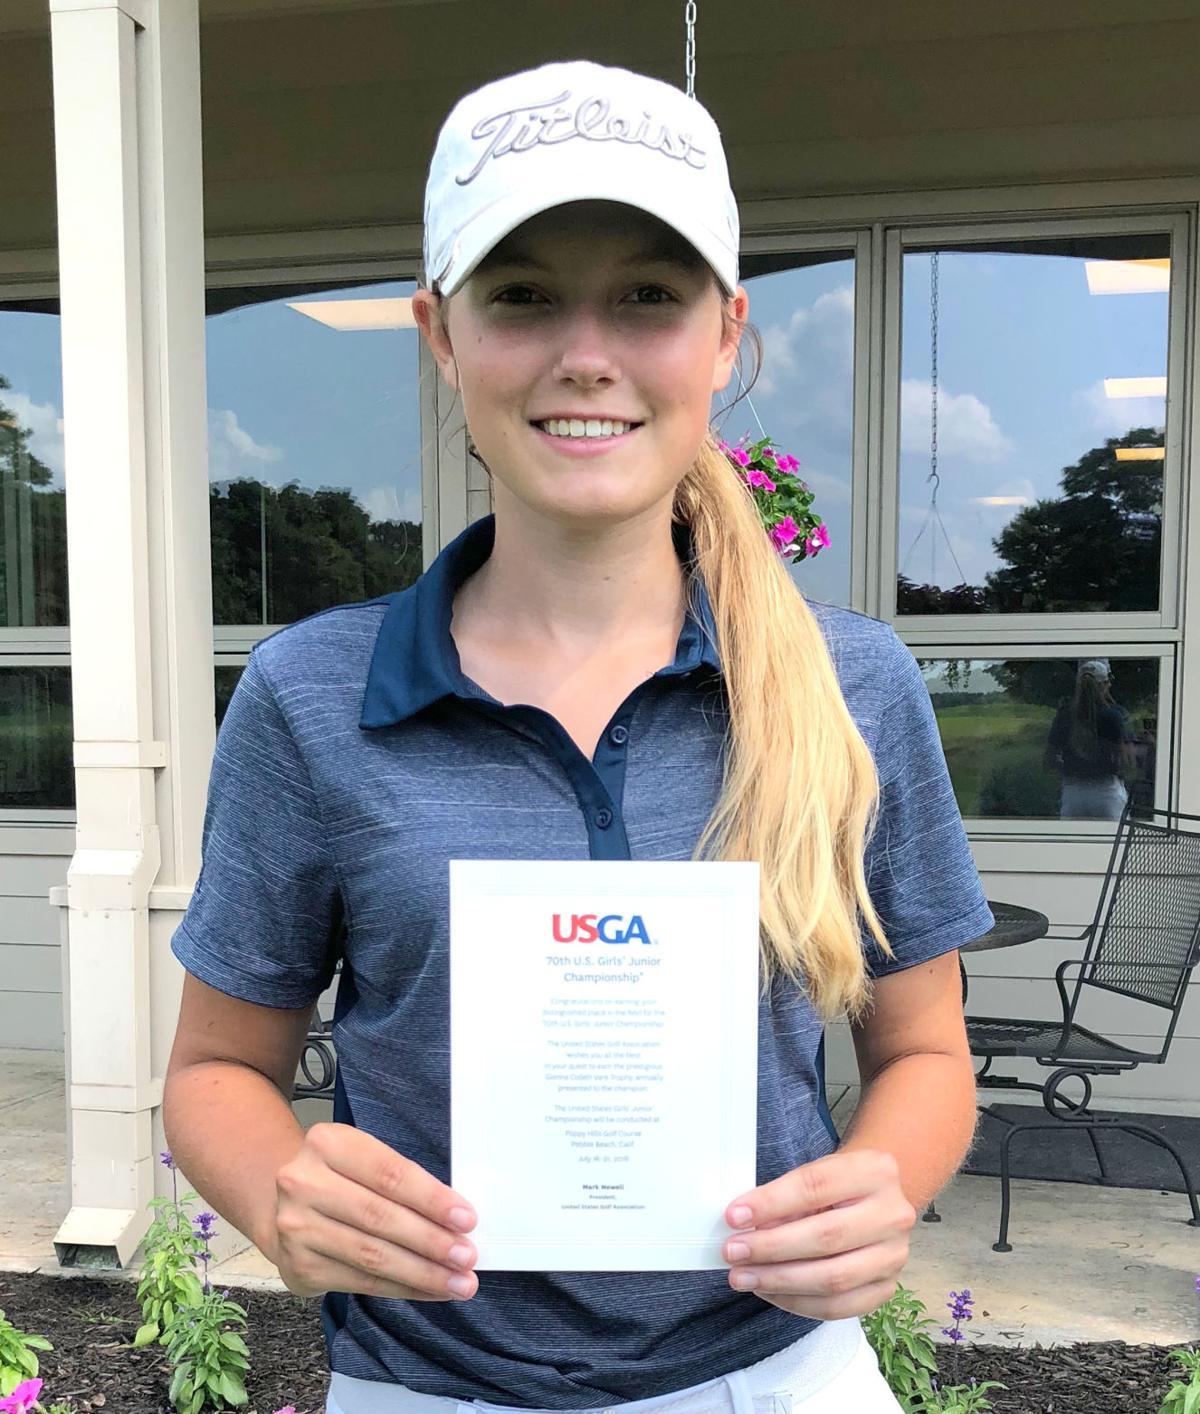 Gilliam earns seat in USGA Championship